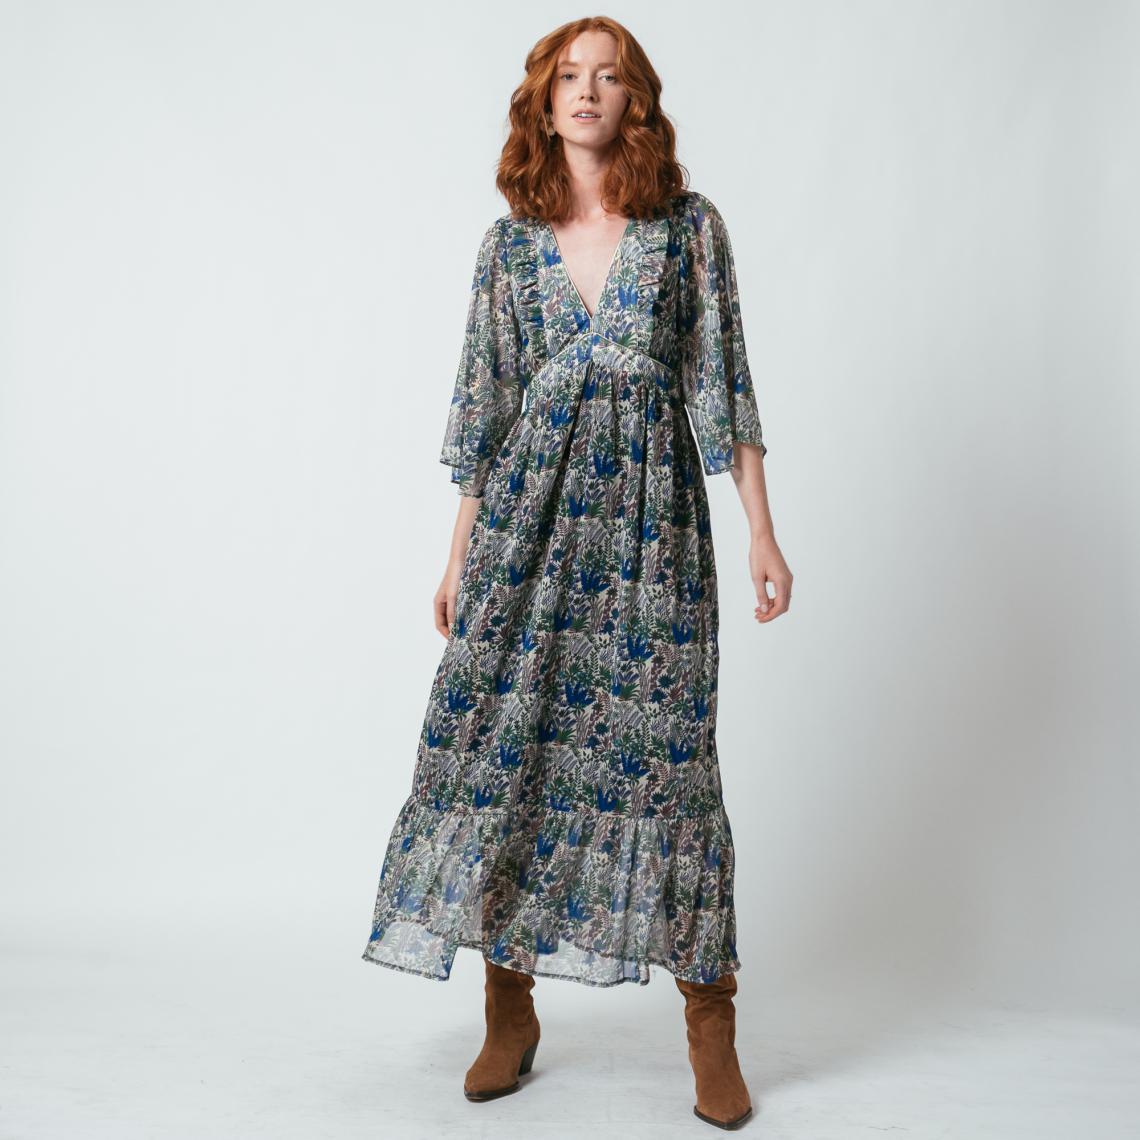 Robe Longue Imprime 50 Remise Www Boretec Com Tr